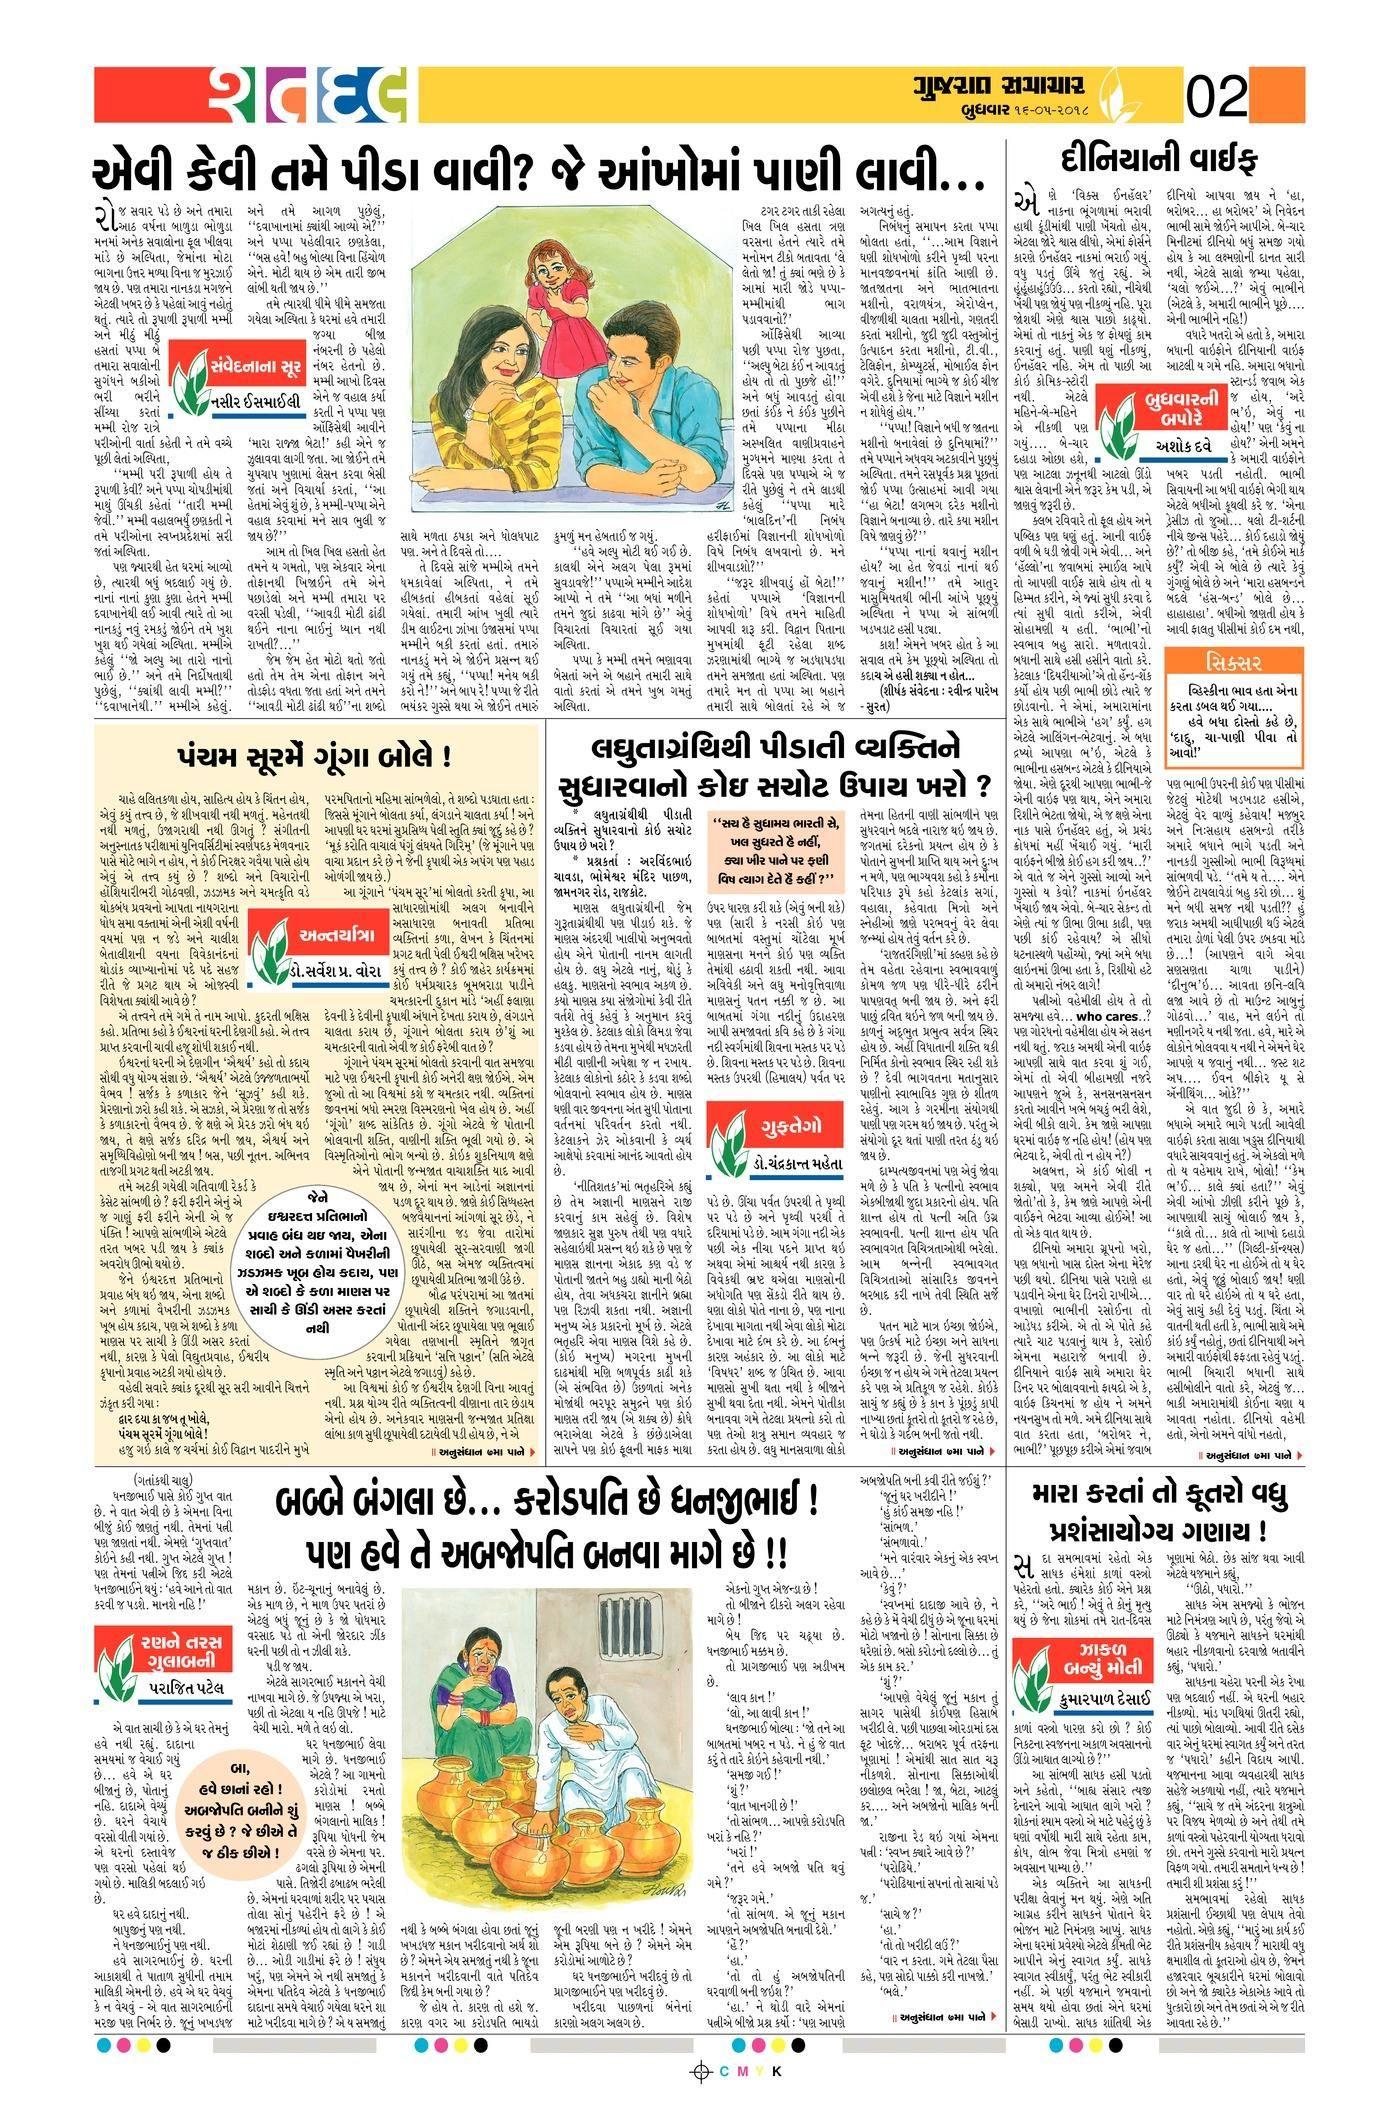 Gujarat Samachar Epaper Shatdal Edition | Icse | Bullet Journal - Printable Gujarati Crossword Puzzles